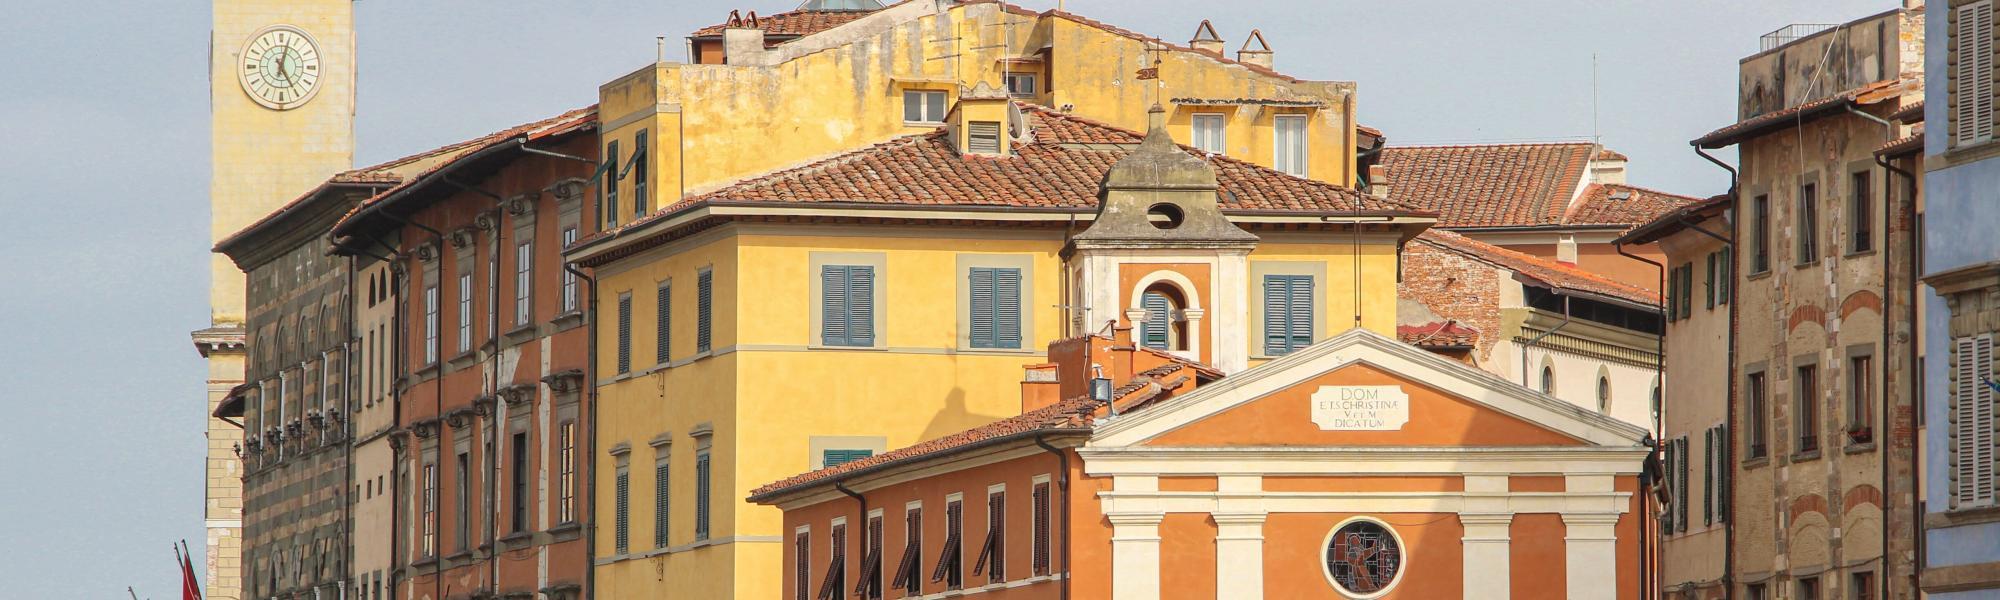 Veduta Chiesa di Santa Cristina dai lungarni (G. Bettini, Comune di Pisa)